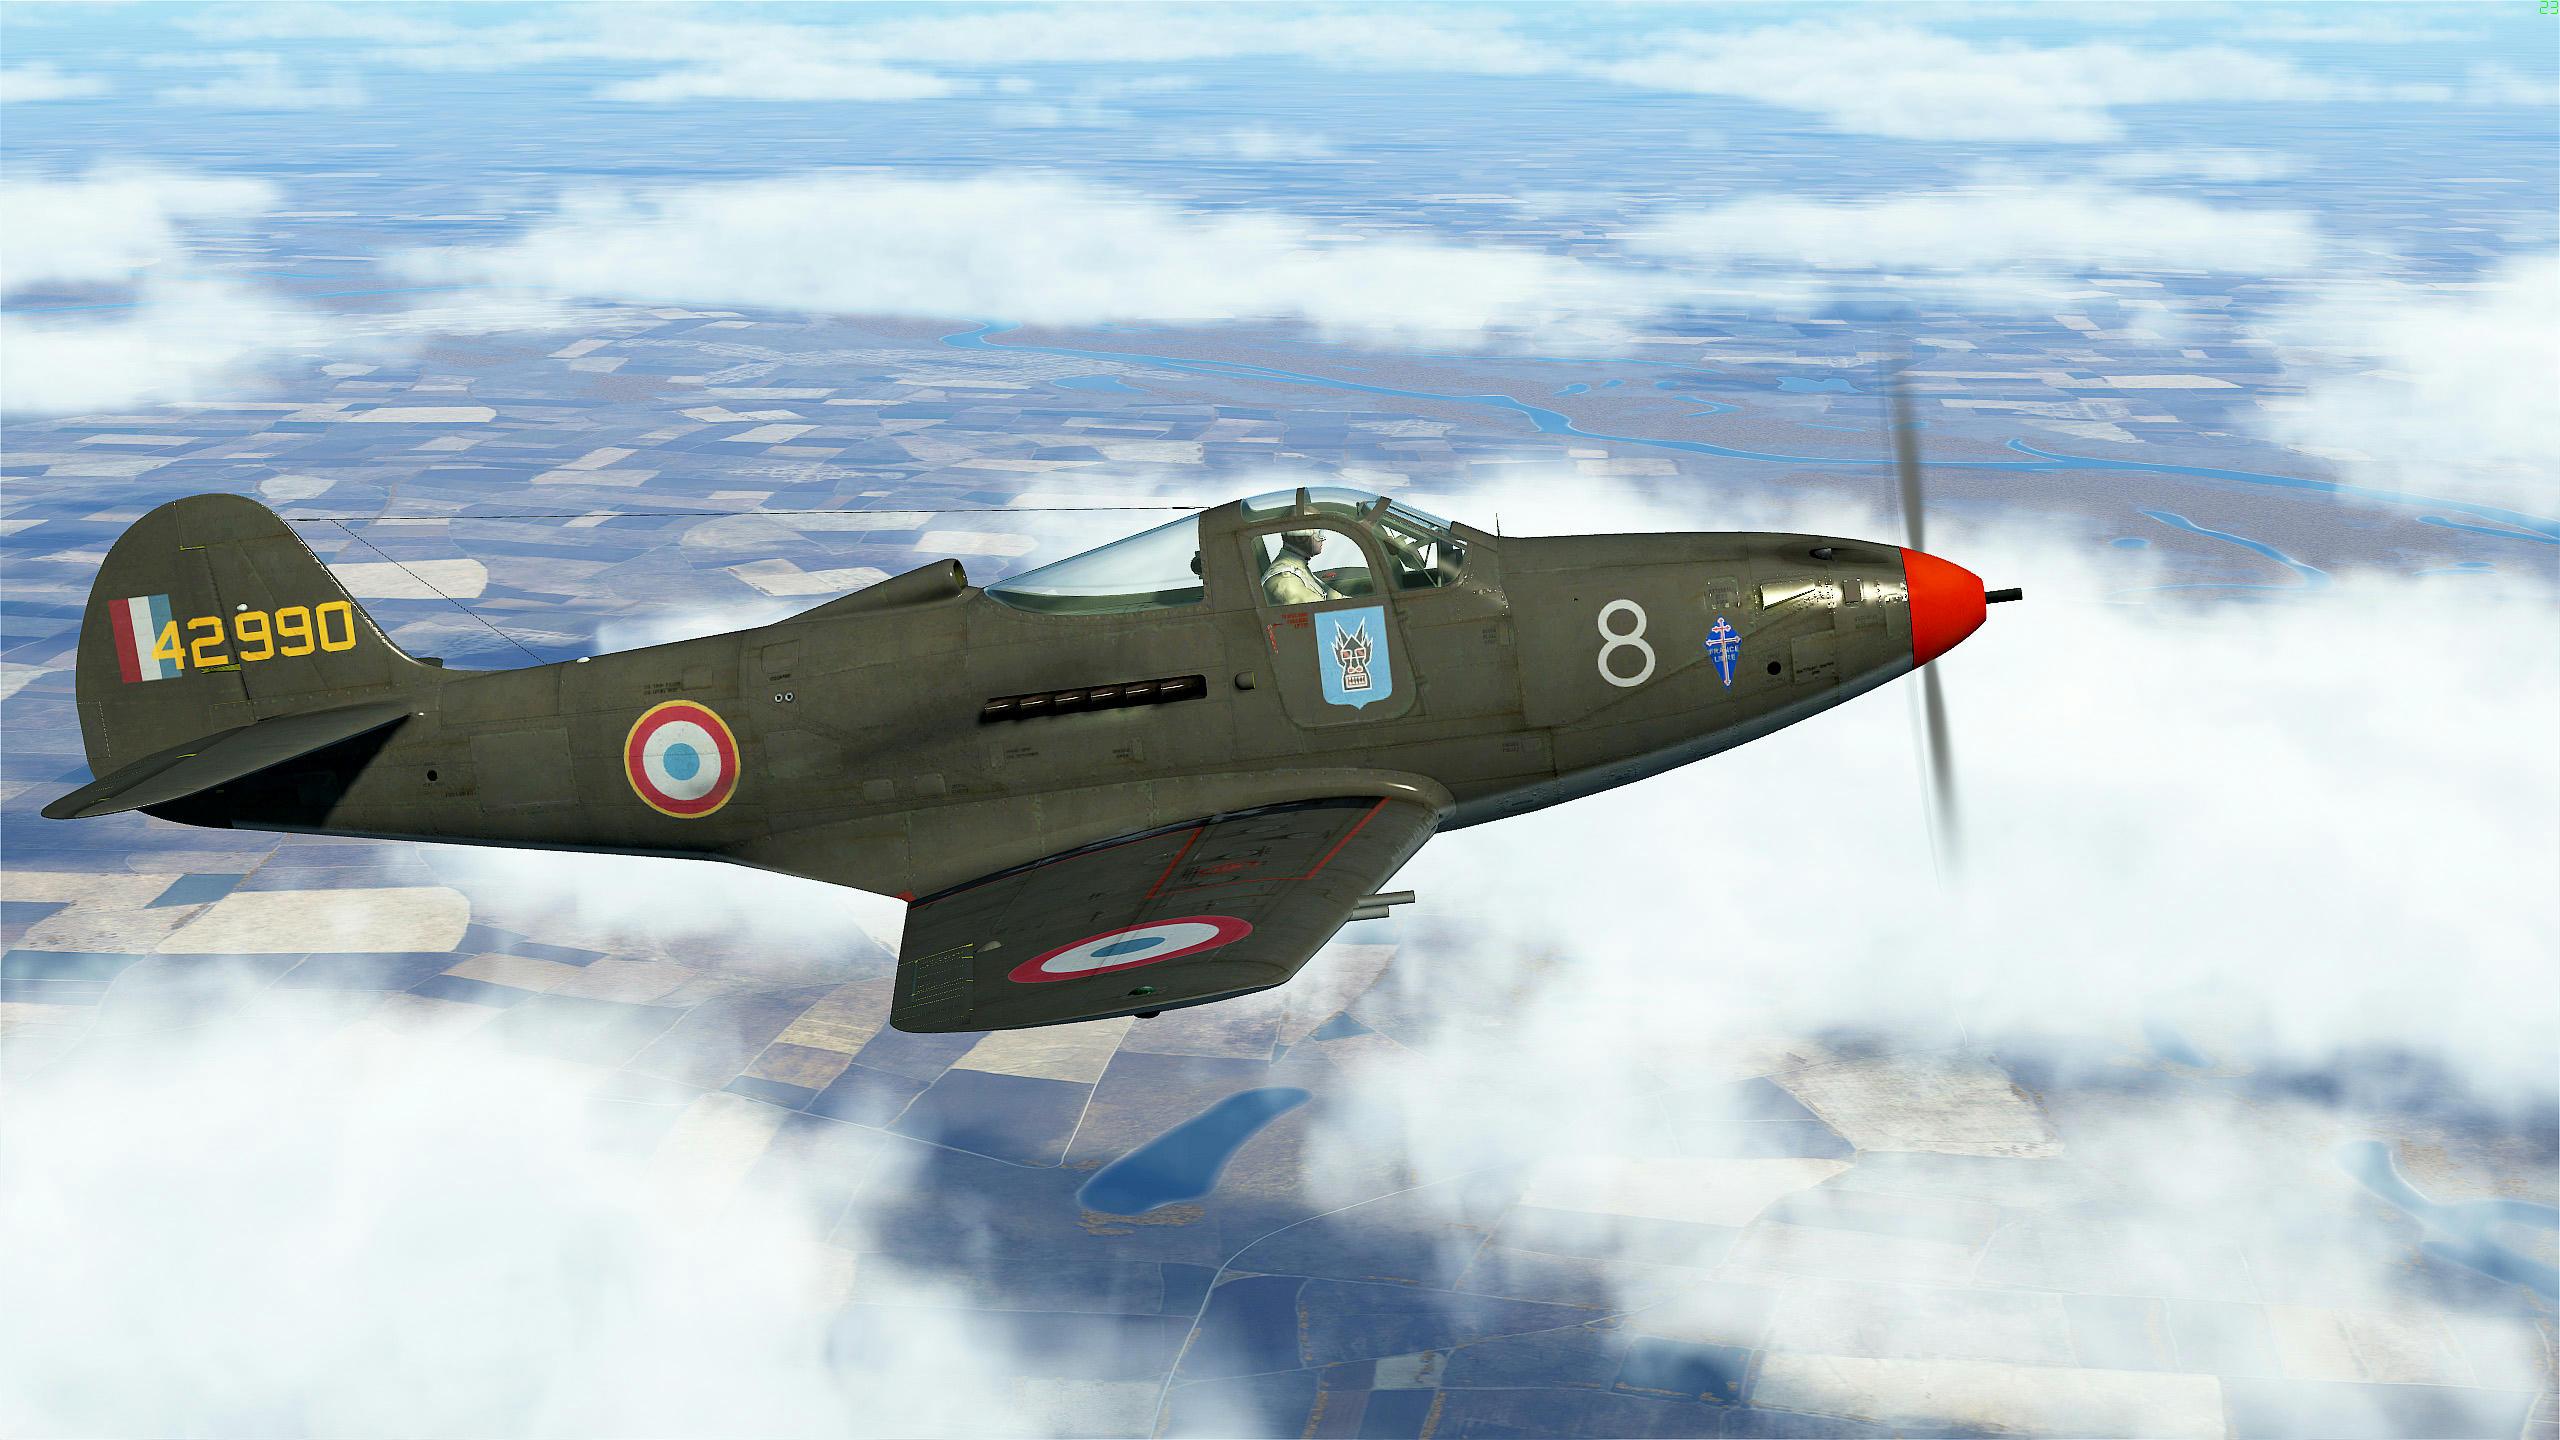 PACK P-39 FRANCAIS Vd13kty68zijy94zg